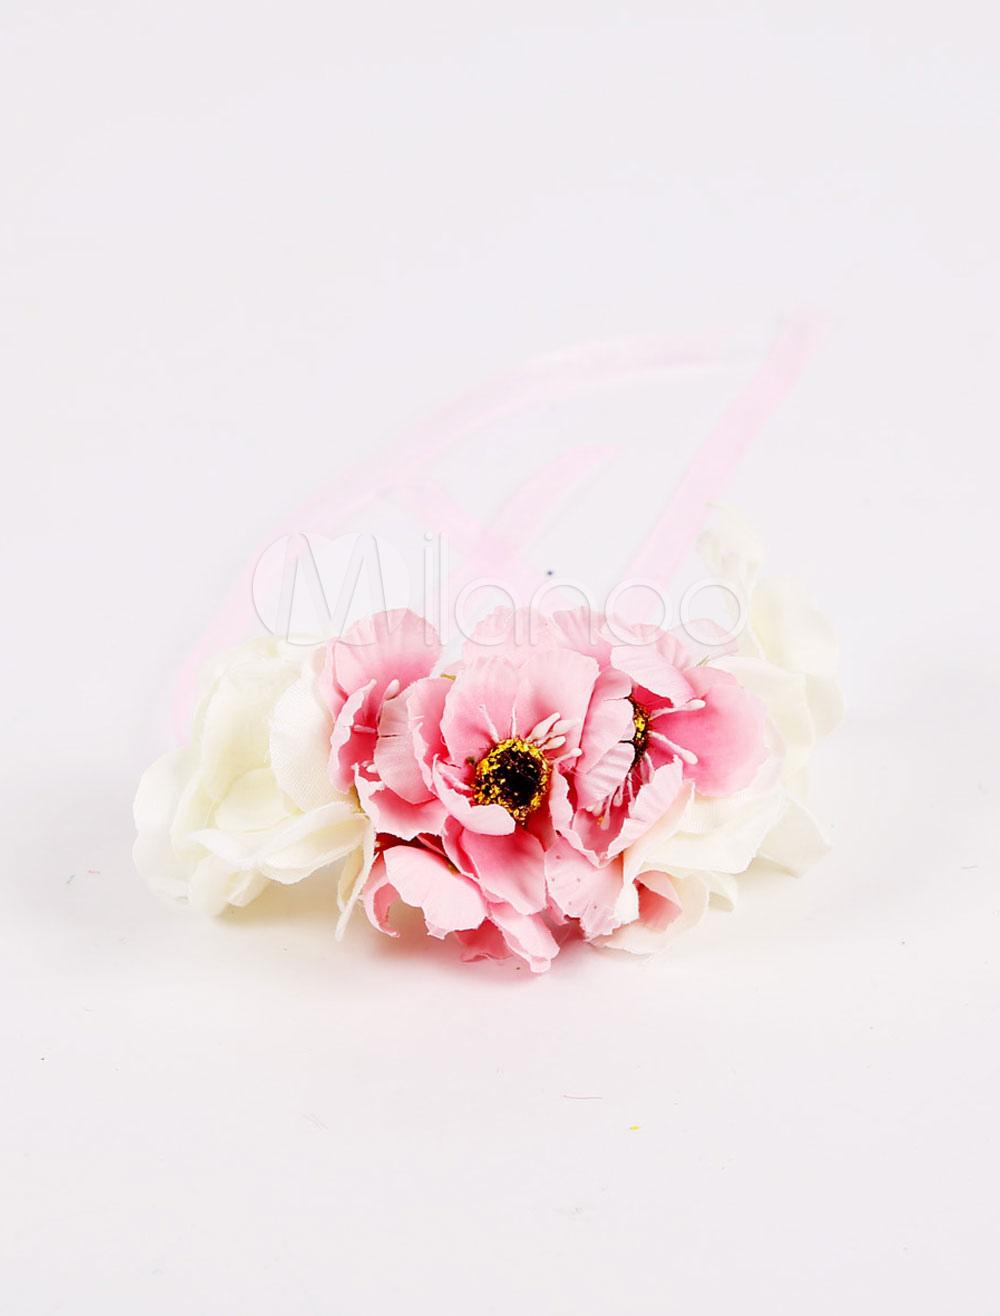 Wedding Wrist Corsage Ribbons Bridesmaid Flower Handmade Prom Flower(8 X 12 X 5 Cm )